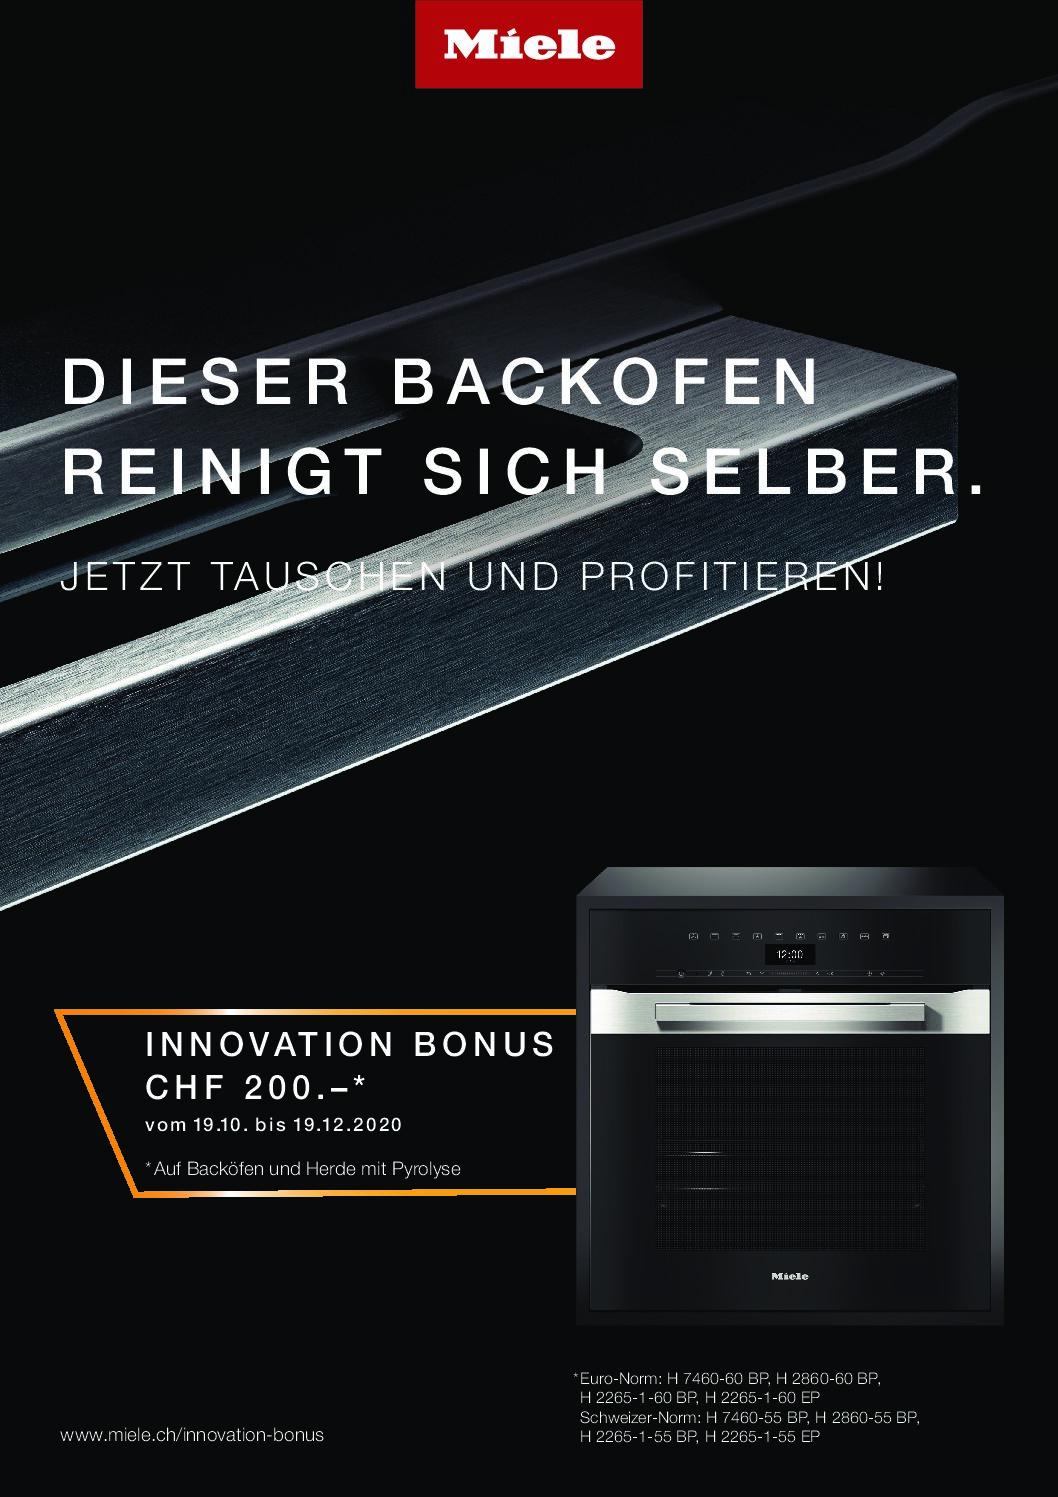 Miele Aktion Innovation Bonus Herde_Backöfen